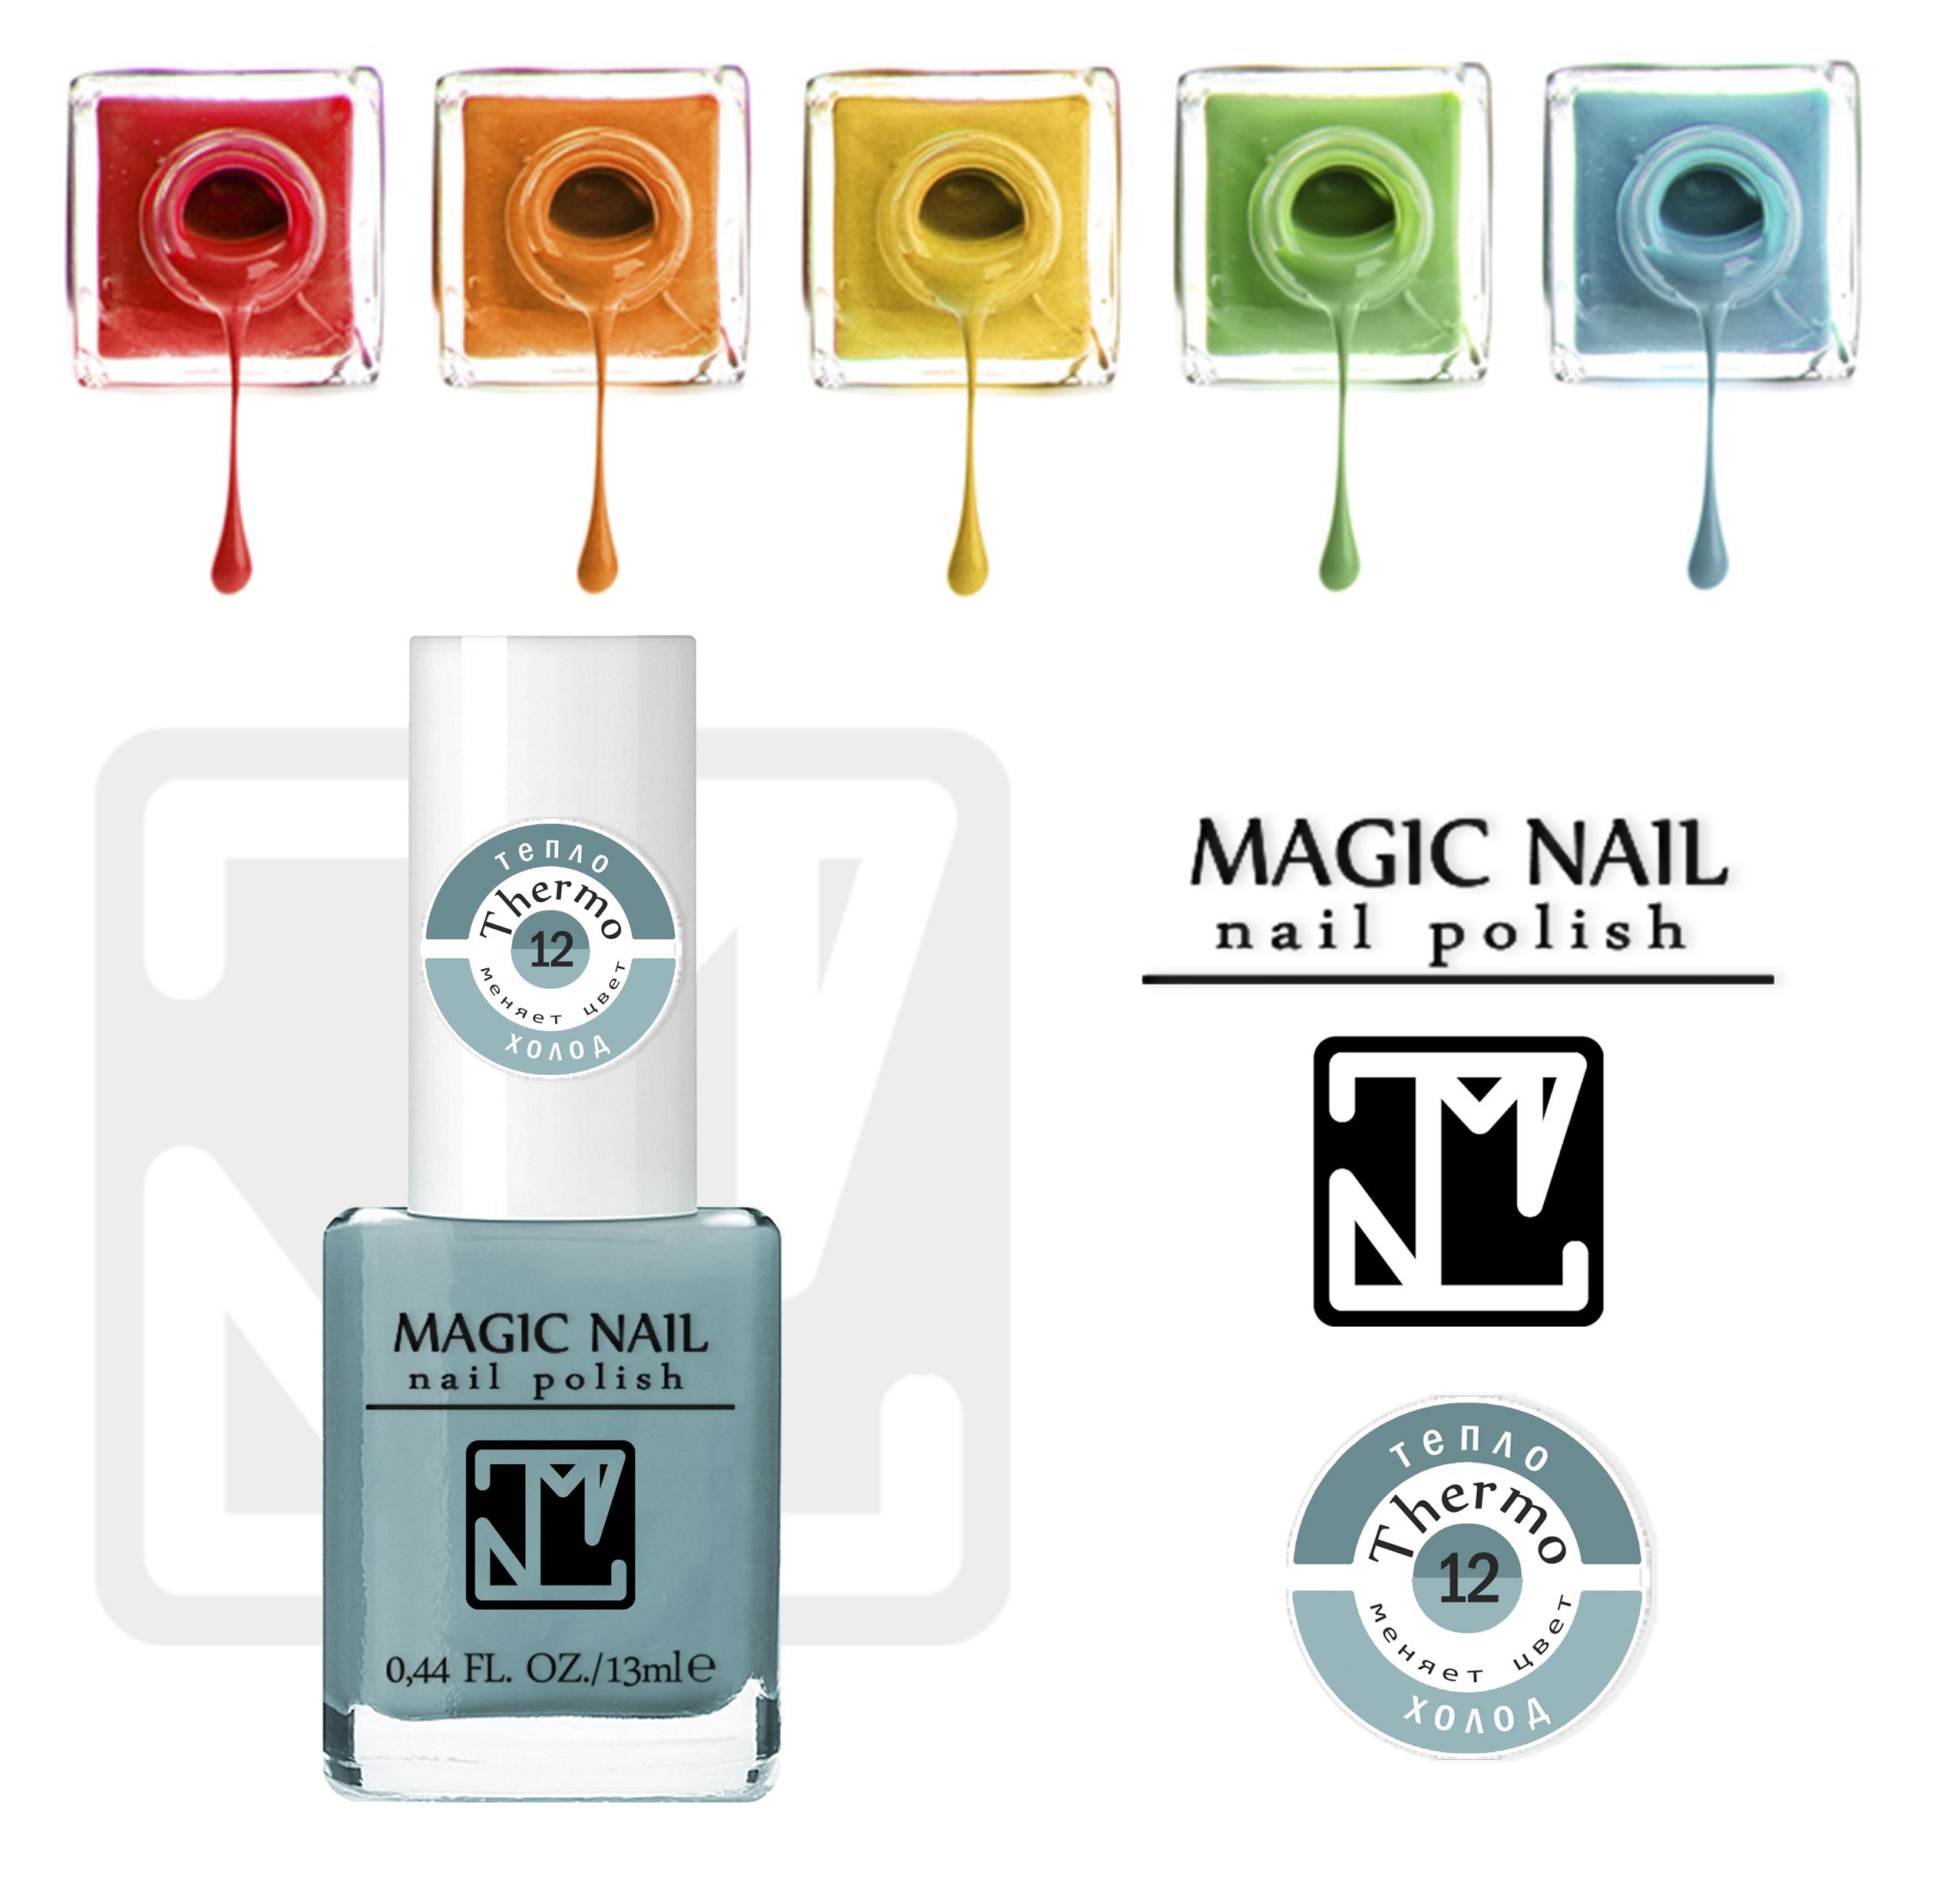 Дизайн этикетки лака для ногтей и логотип! фото f_3615a0eb84d63992.jpg